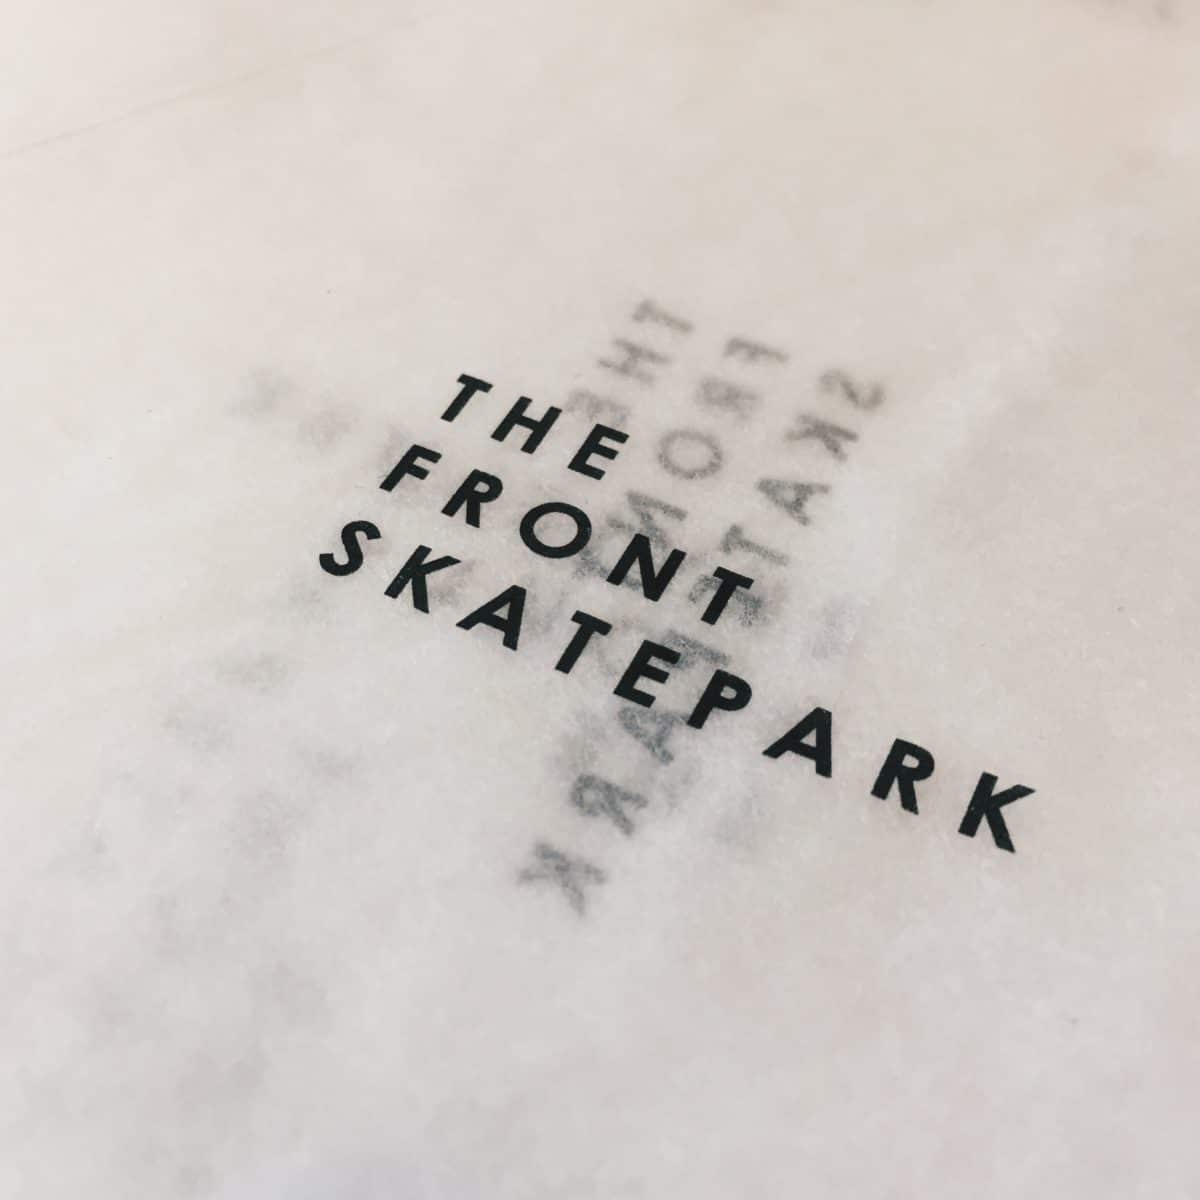 New Work — Tissue Paper.The Front Skatepark .#logo #Brand #Branding #Design #Graphicdesign #Luxury #pattern #packagingdesign #packaging #British #NewRelease #Style #contemporary #handmade #london #dorset #repeat #graphicdesigner #graphicdesign #designagency #brandingagency #paper #tissuepaper #noissue